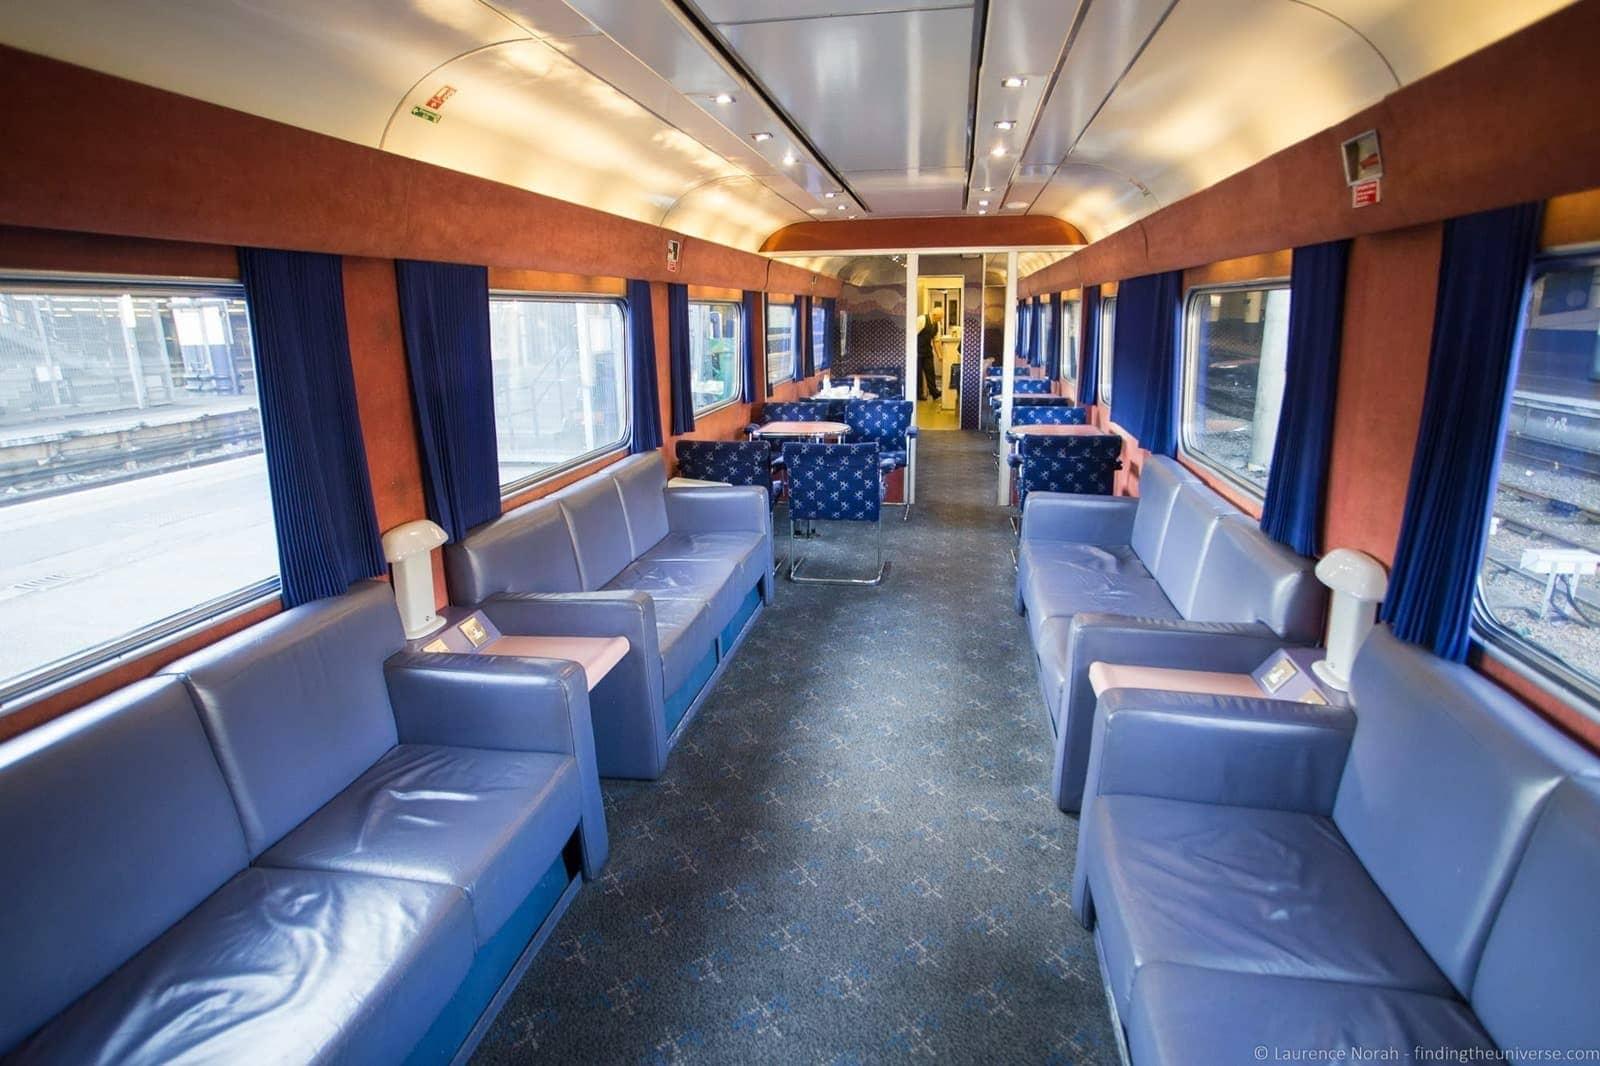 Caledonian Sleeper Lounge Car